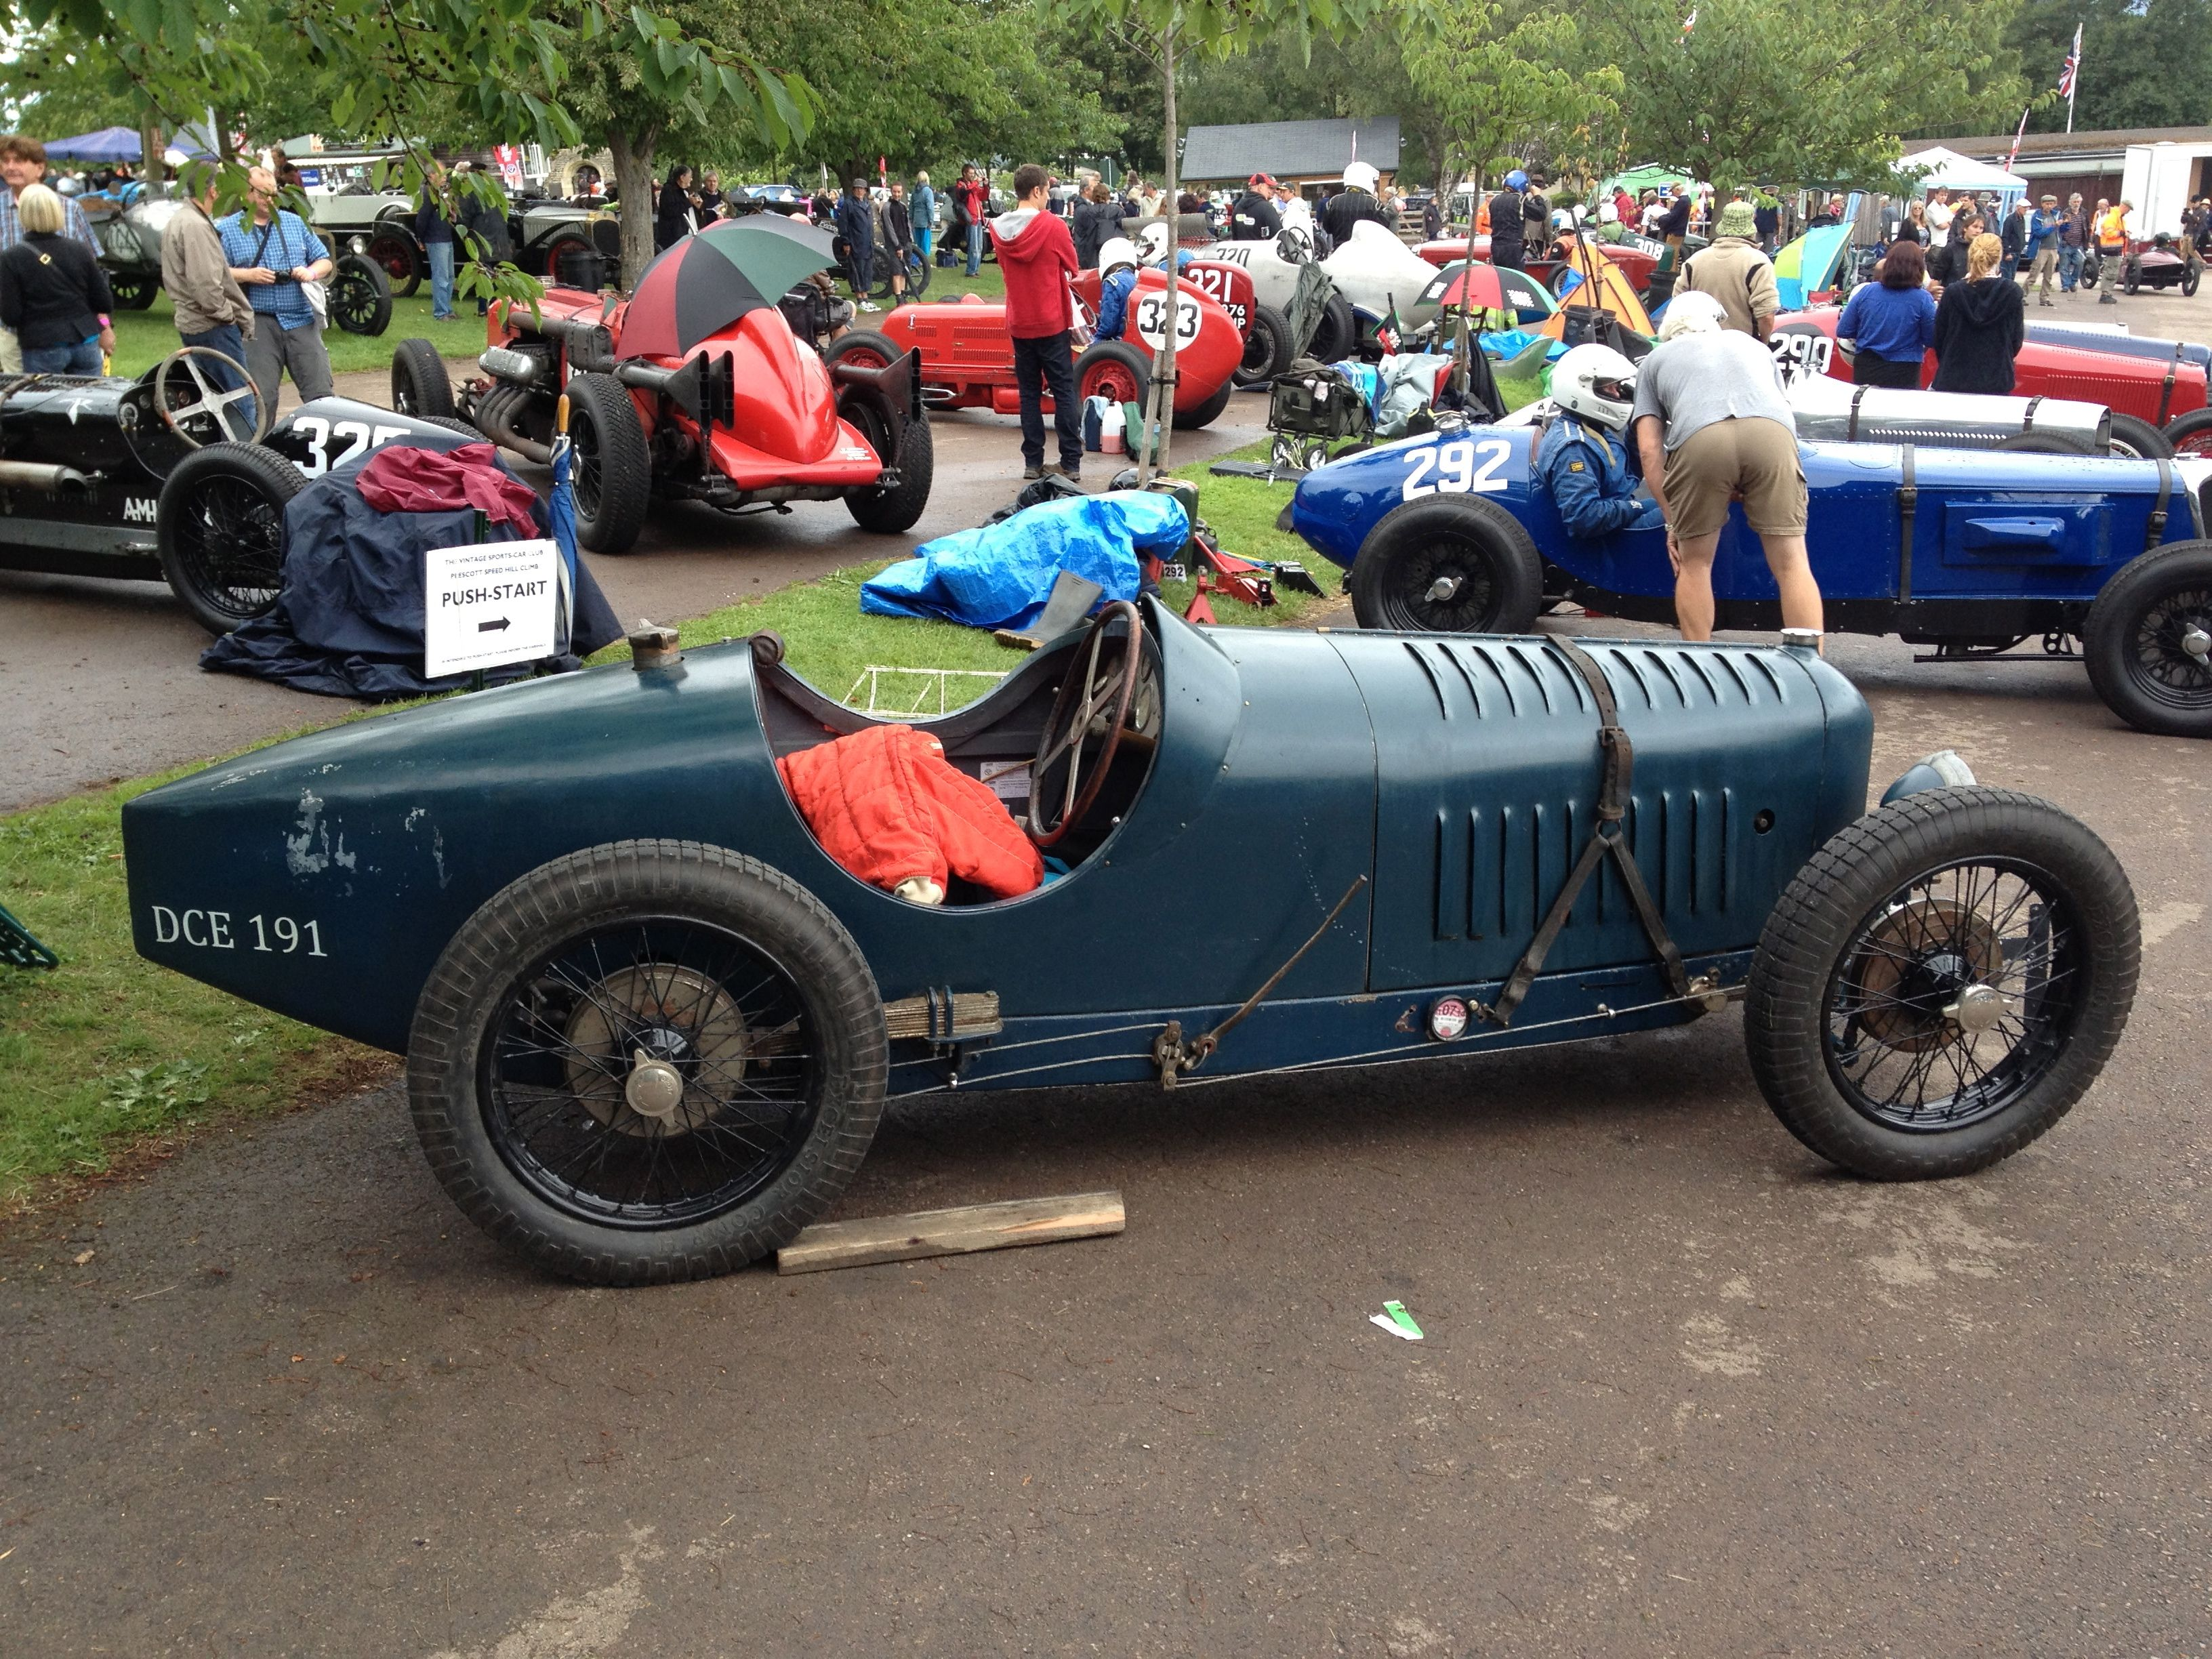 Amilcar. | Cars | Pinterest | Cars, Car restoration and Sports cars